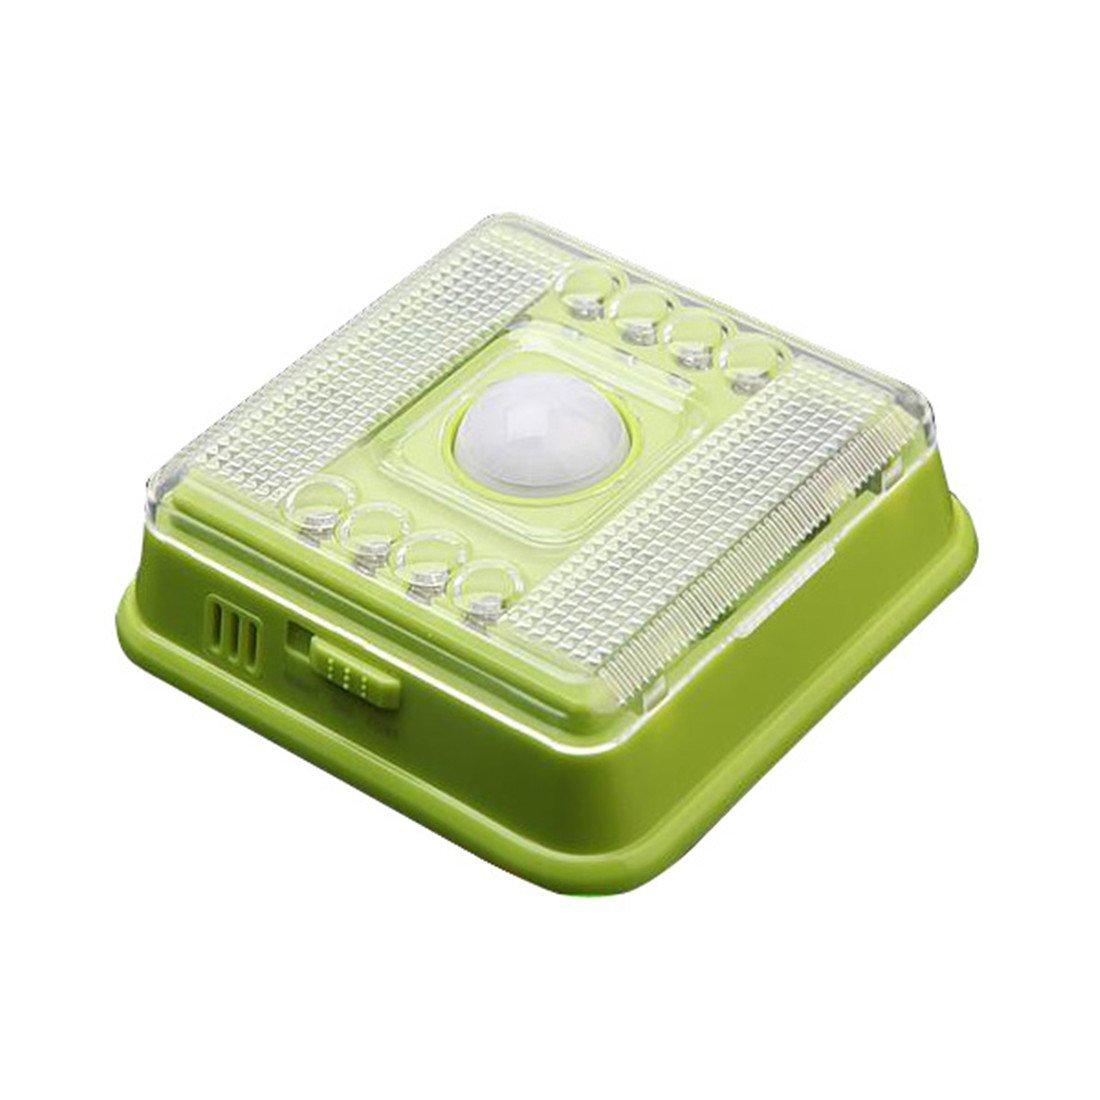 led auto motion sensor detector indoor night light lamp a4f6. Black Bedroom Furniture Sets. Home Design Ideas